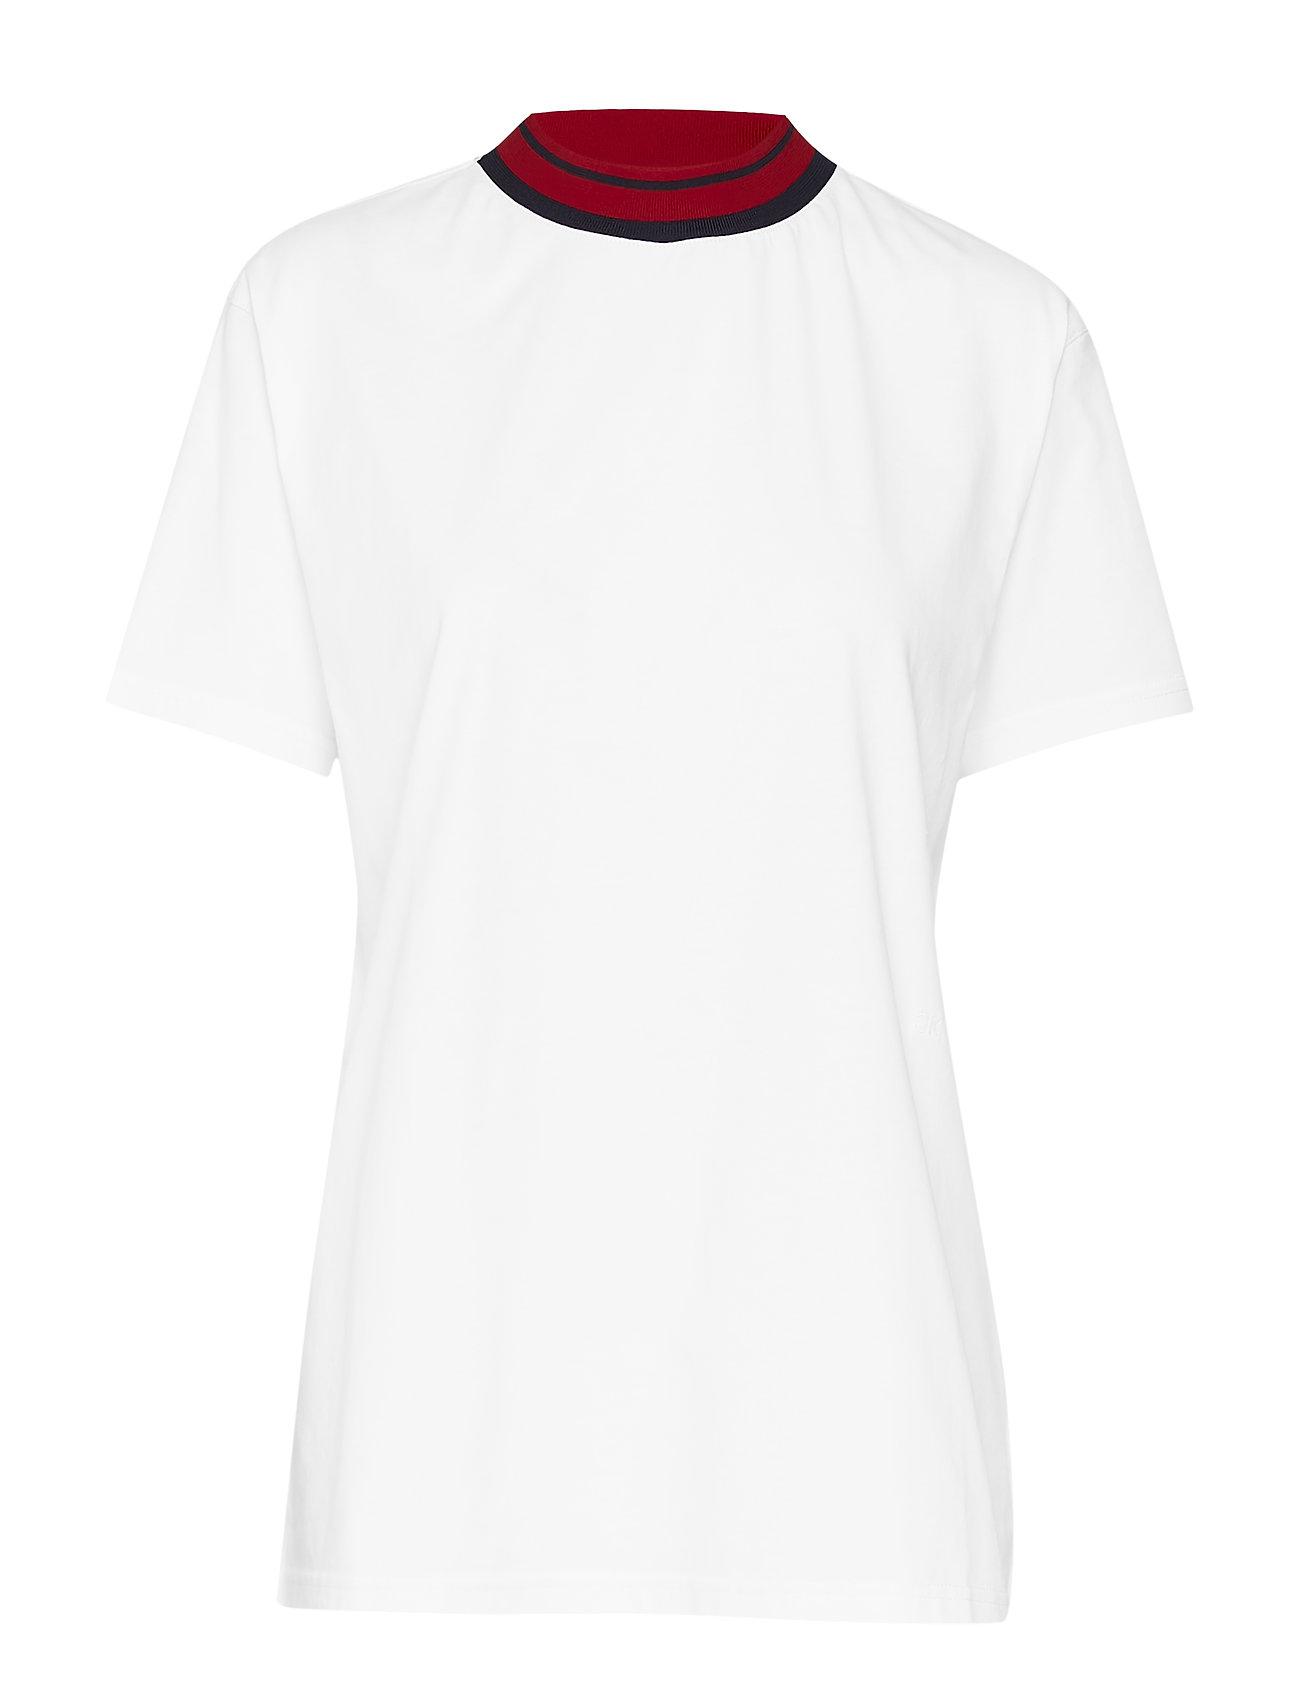 Calvin Klein MOCK- NK STP DETAIL - WHITE